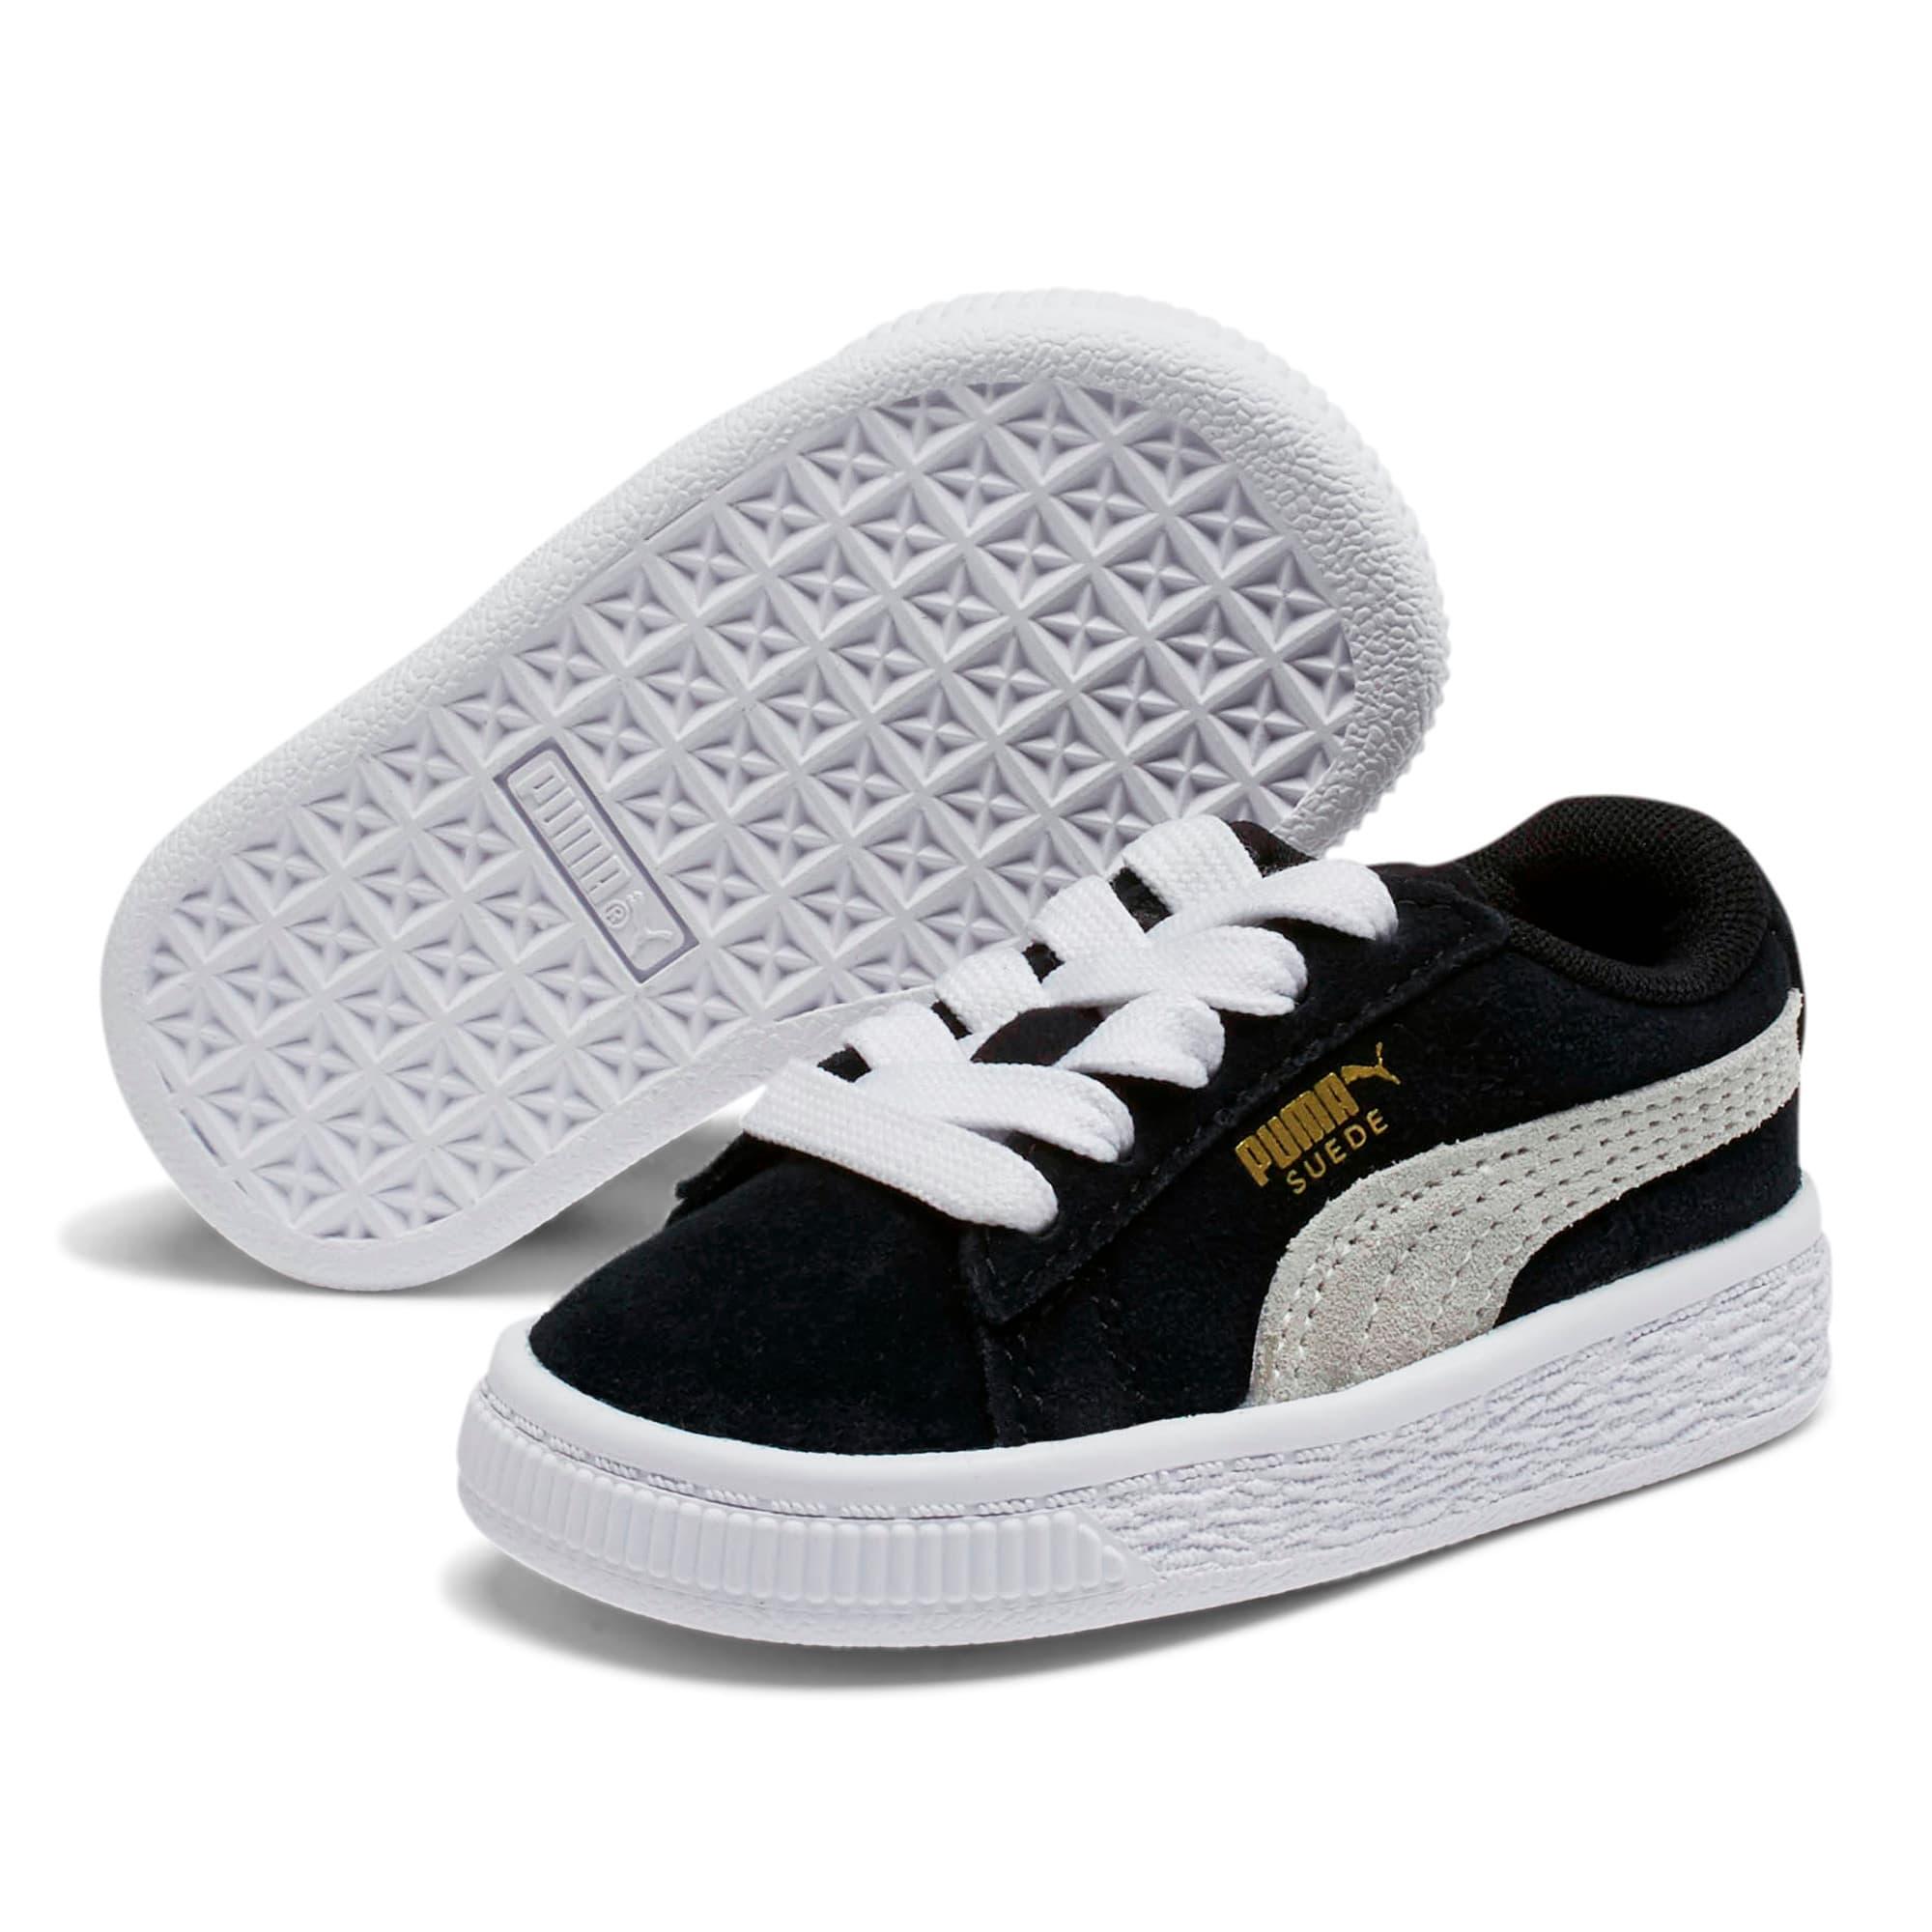 Thumbnail 2 of Puma Suede Toddler Shoes, black-white, medium